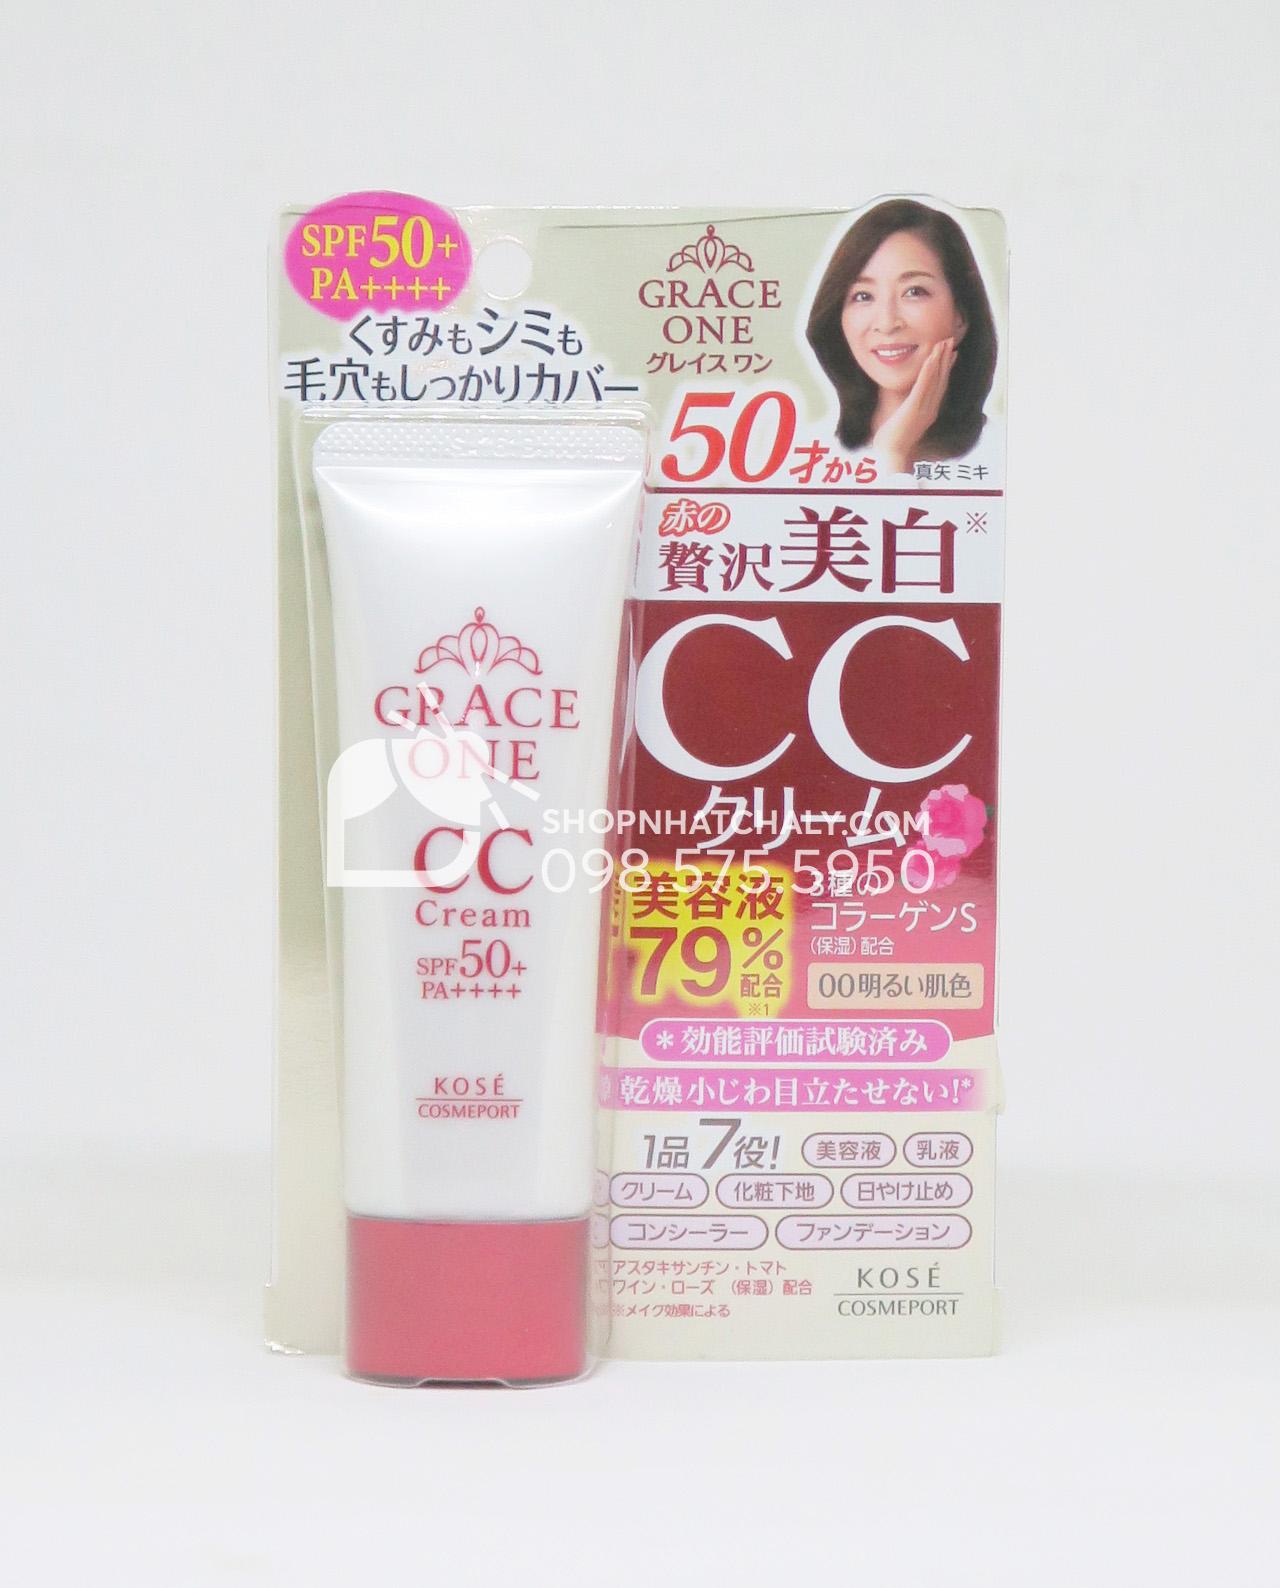 Tuýp kem nền đa năng Kose Grace One CC Cream Nhật